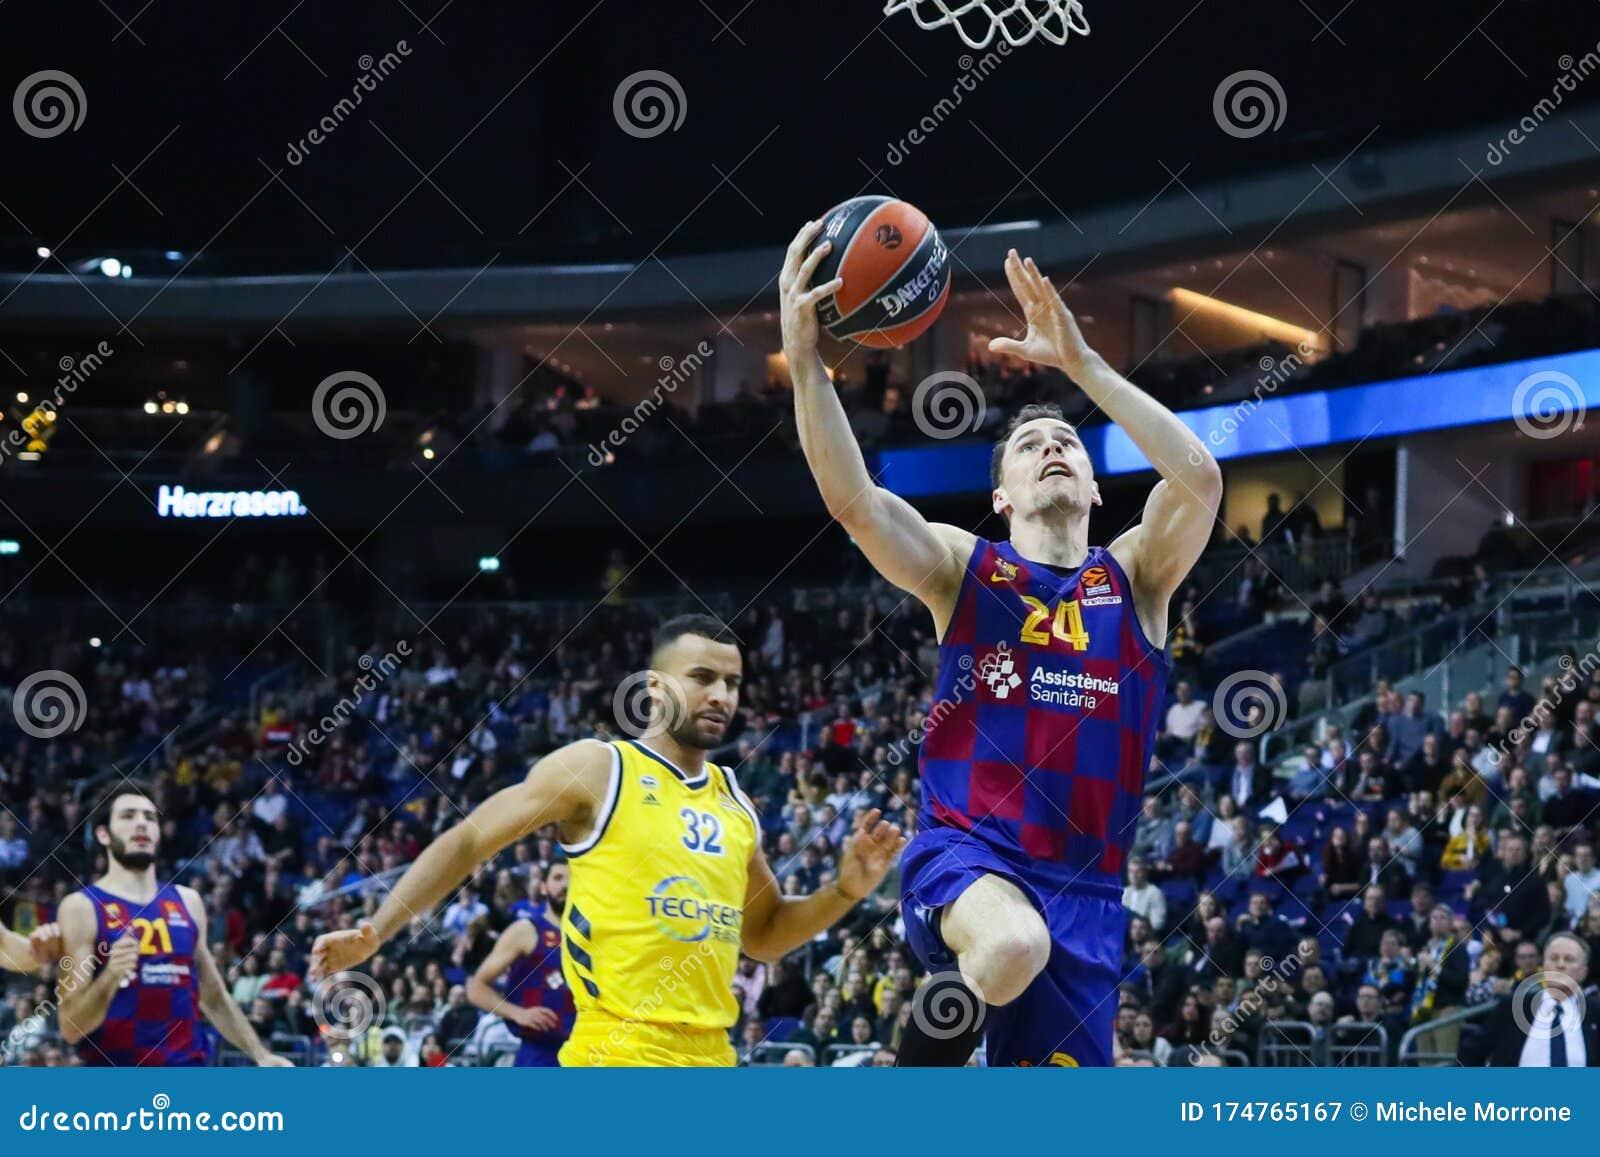 Kyle Kuric Of Fc Barcelona Basketball Editorial Photography Image Of League Jump 174765167